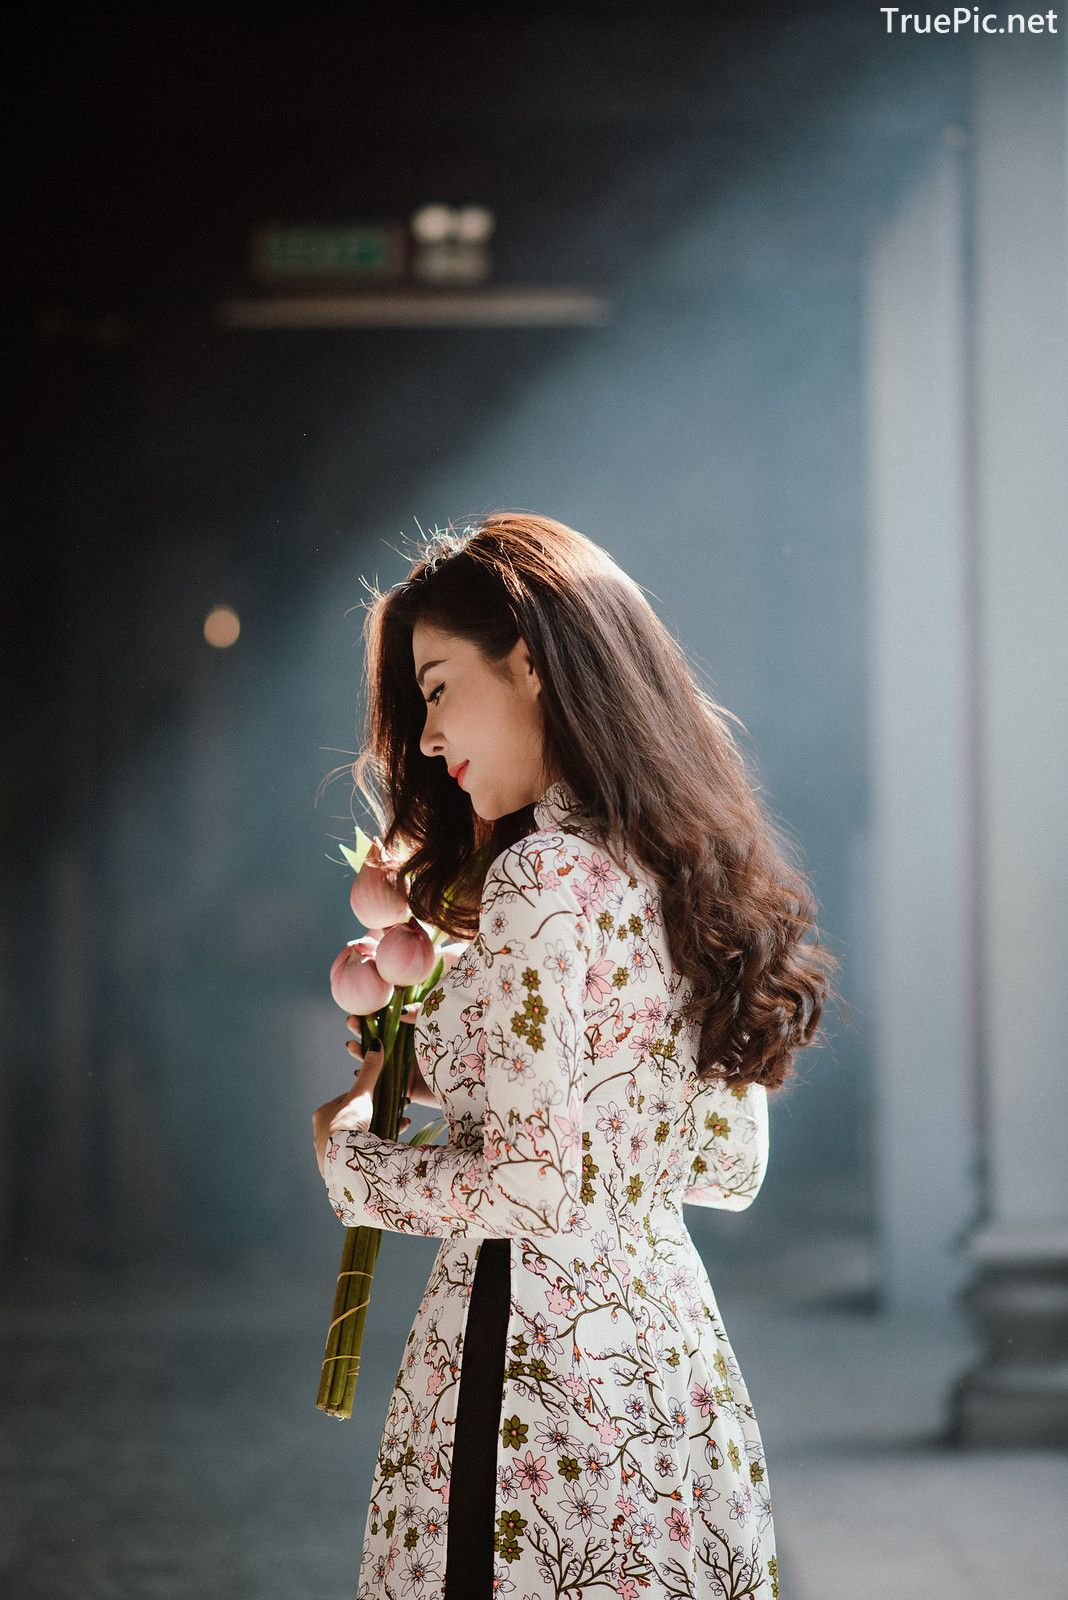 Image-Vietnamese-Beautiful-Girl-Ao-Dai-Vietnam-Traditional-Dress-by-VIN-Photo-3-TruePic.net- Picture-3